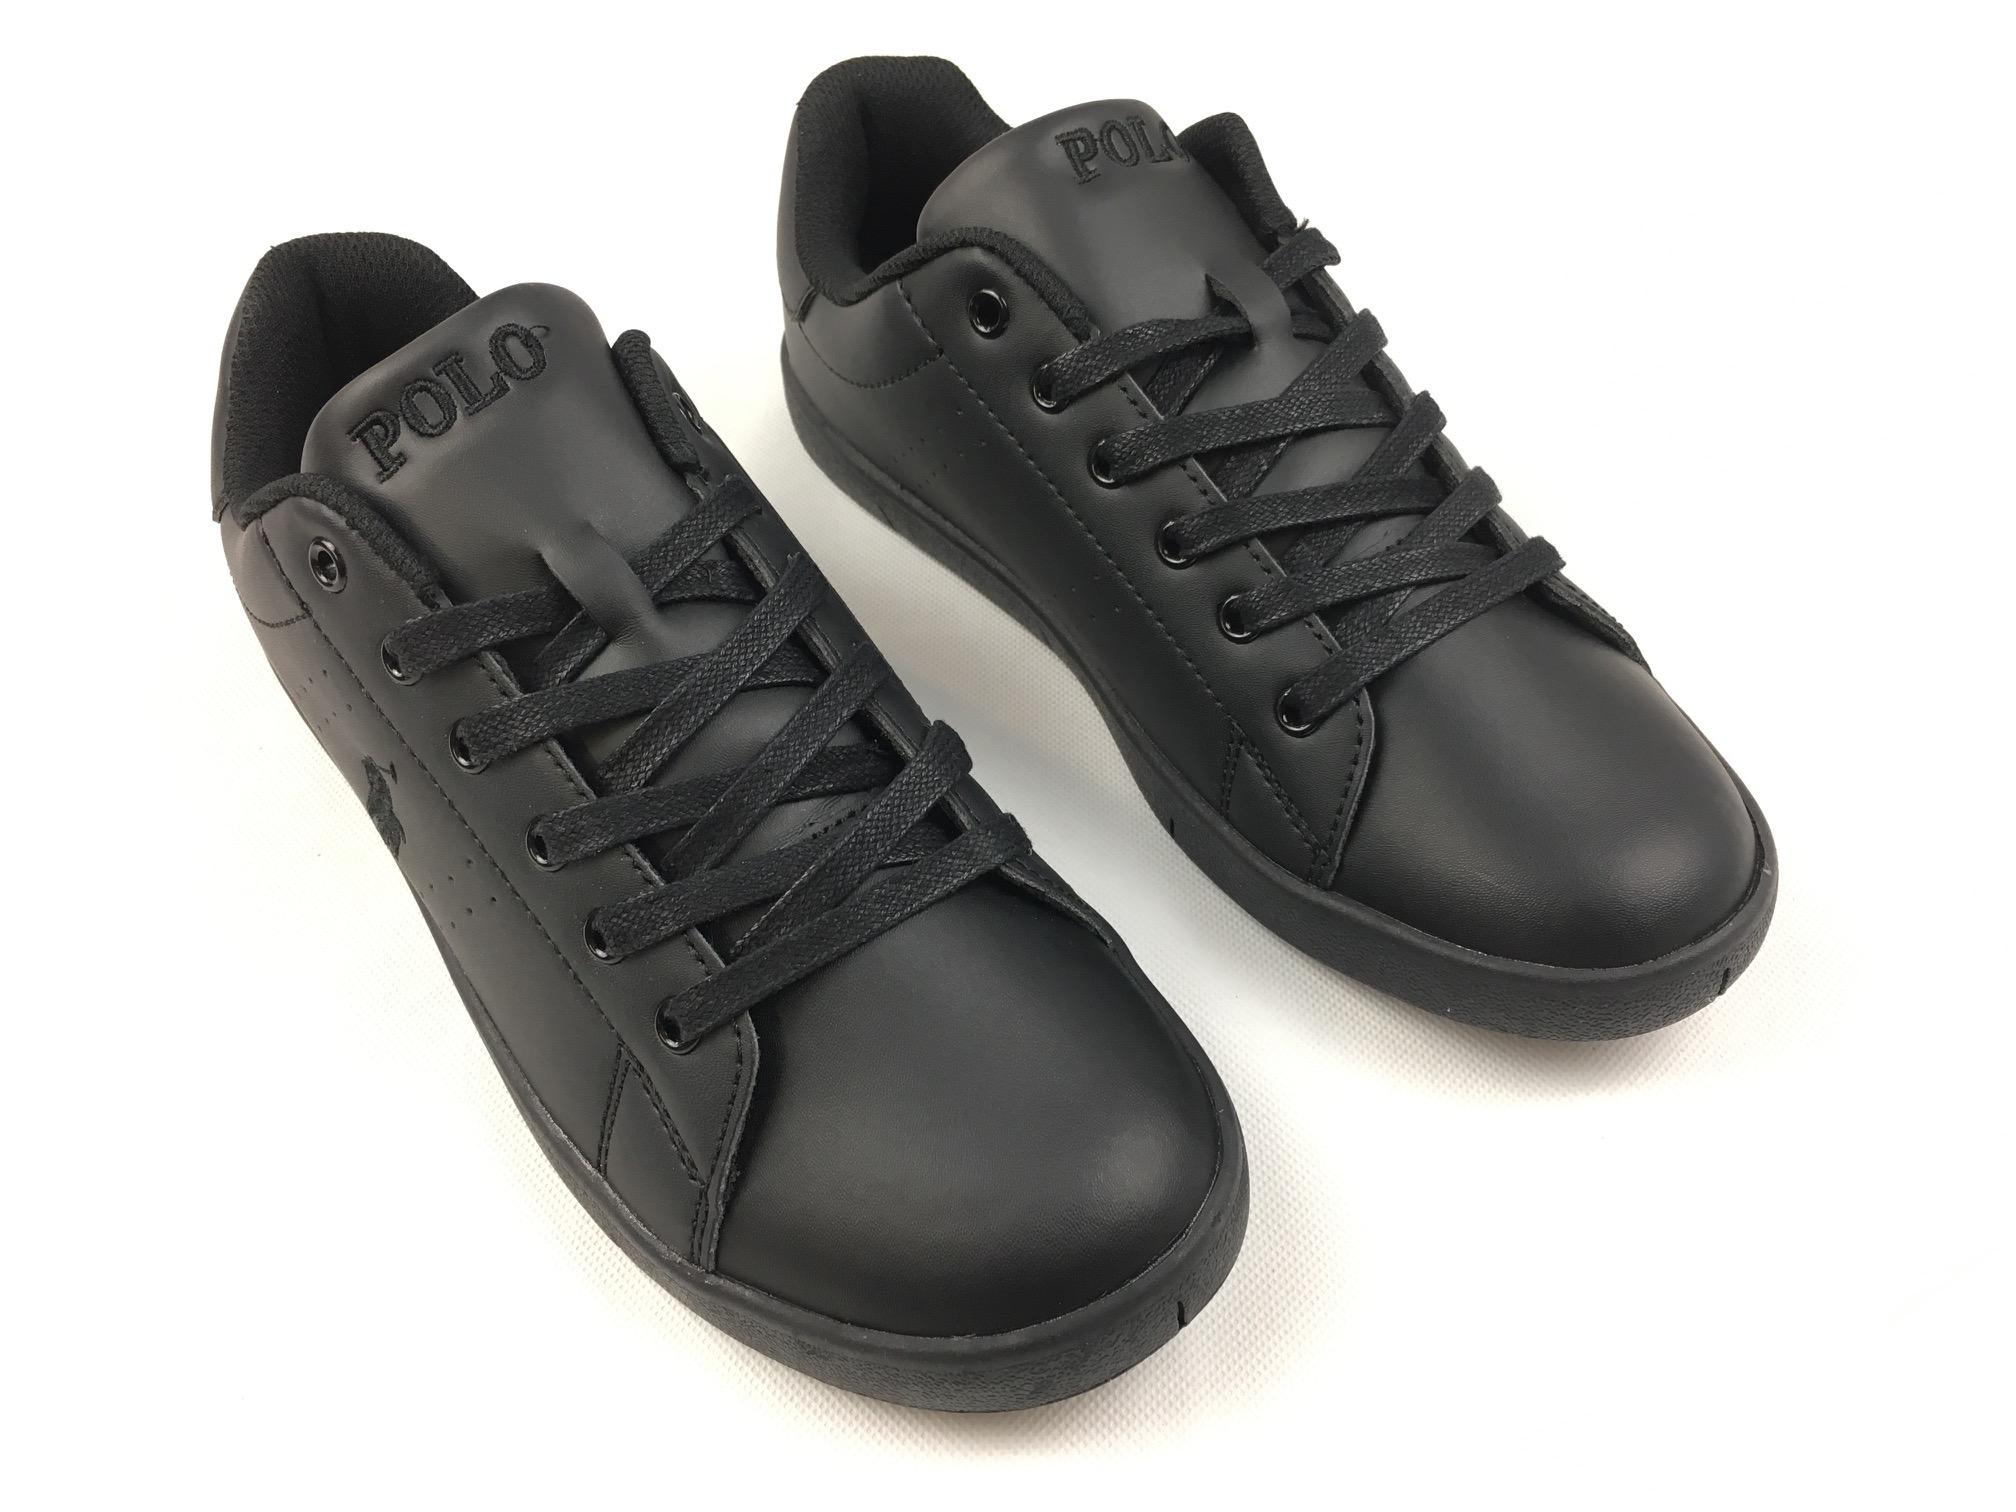 c55d6deba Dámské boty Ralph Lauren Bilton Černé - Glami.sk